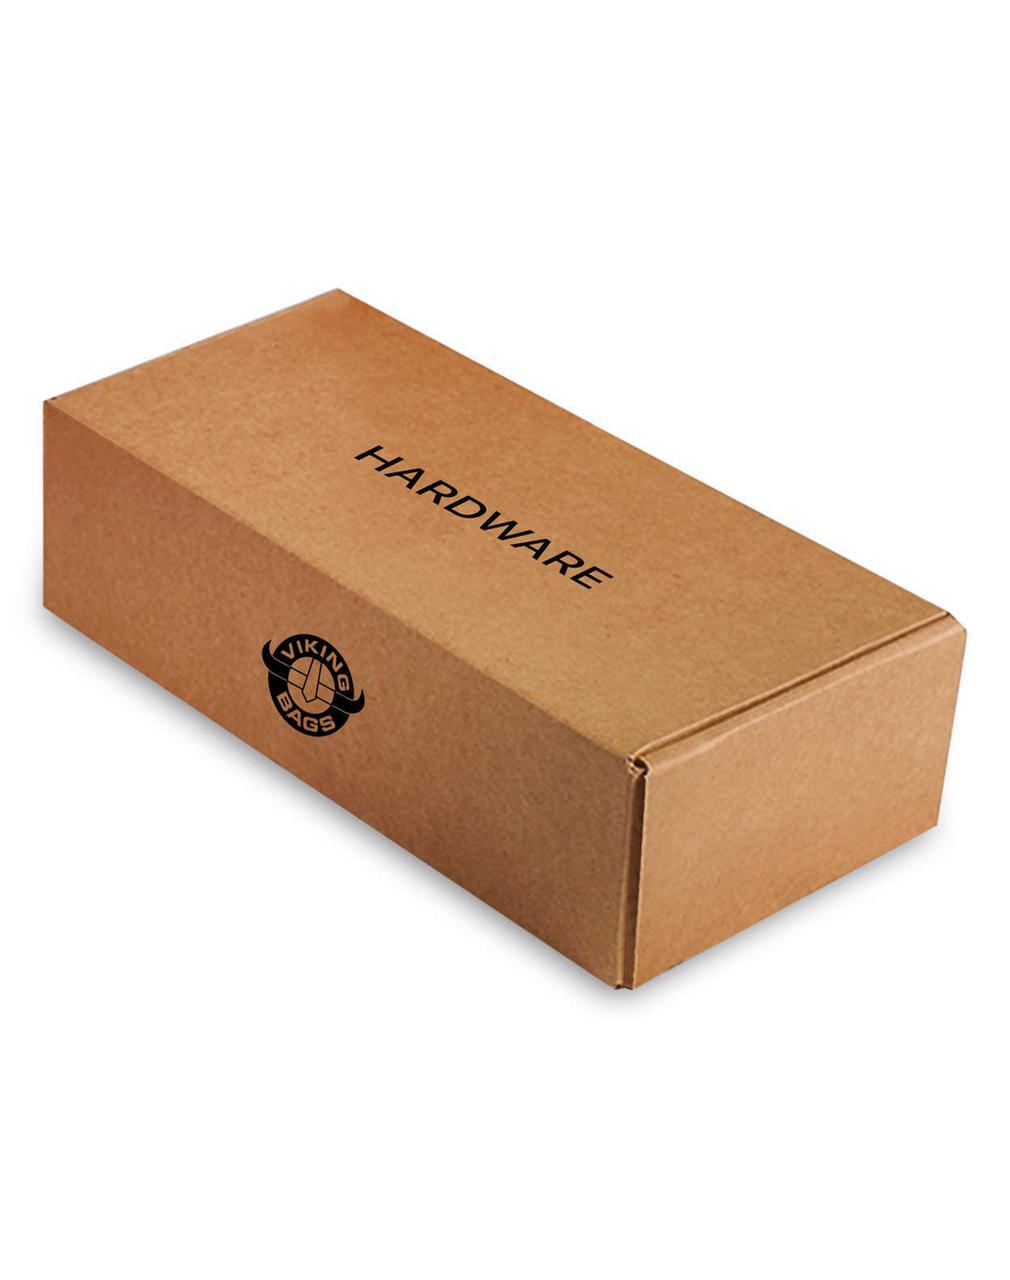 Honda CMX 250C Rebel 250 Shock Cutout Motorcycle Saddlebags Hardware Box